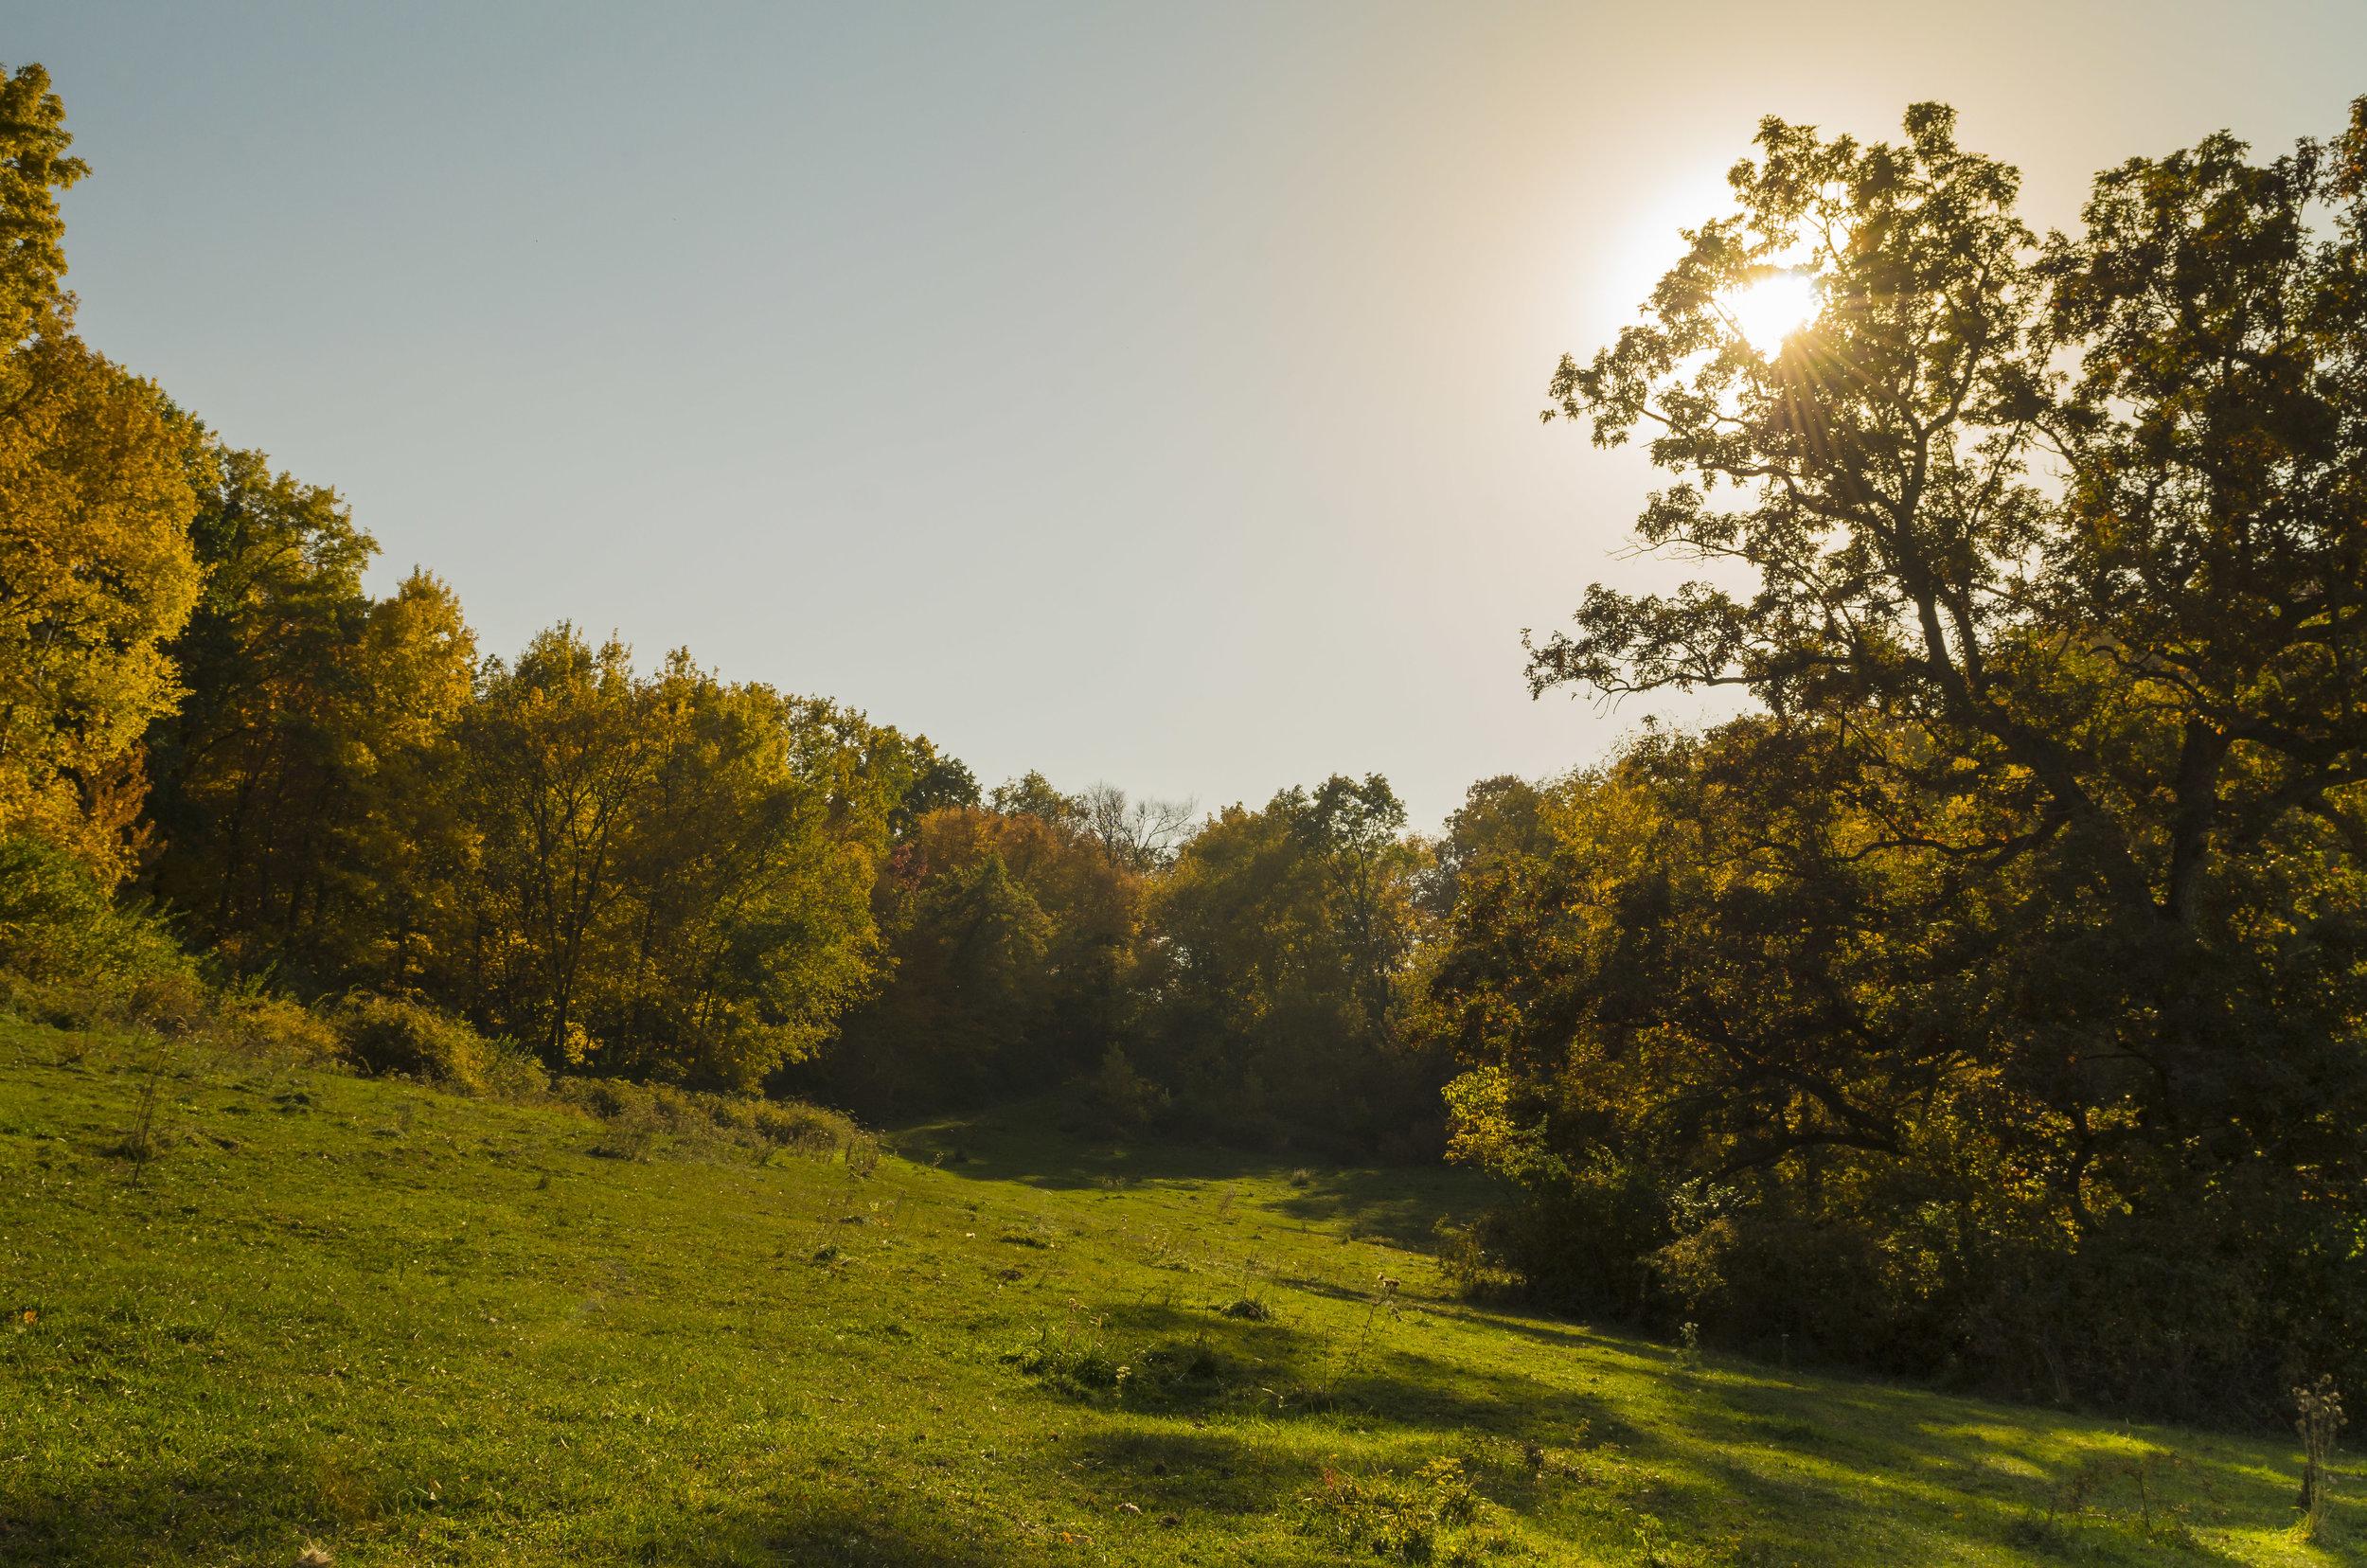 Strauss Farm for Behance-2.jpg